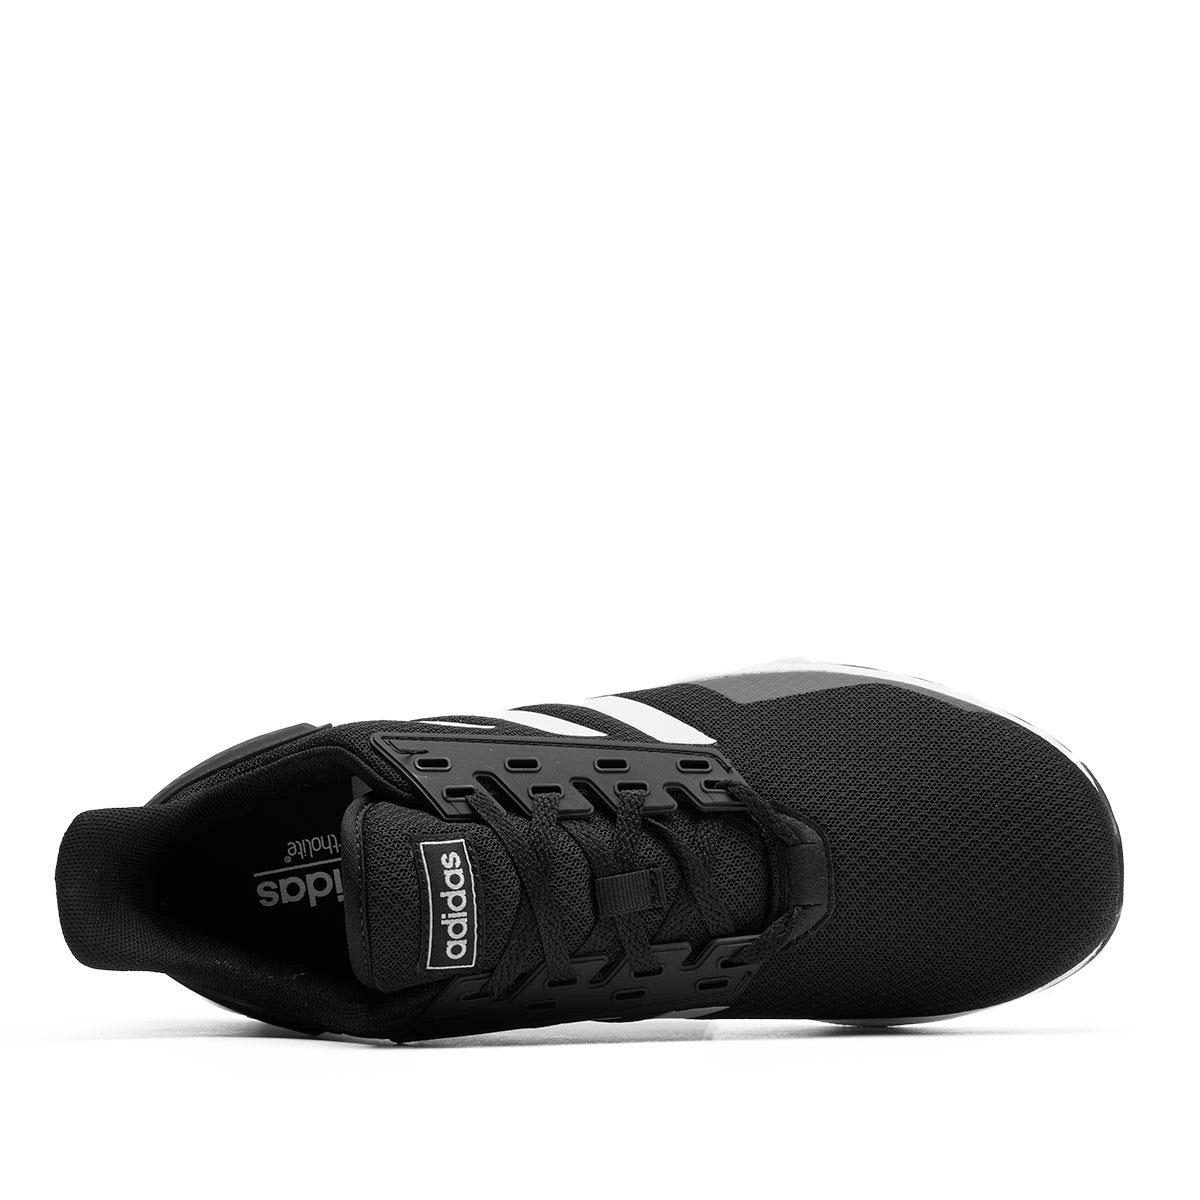 0cd841cac49 Оригинални Мъжки Маратонки Adidas Duramo 9 - ShopSector.com